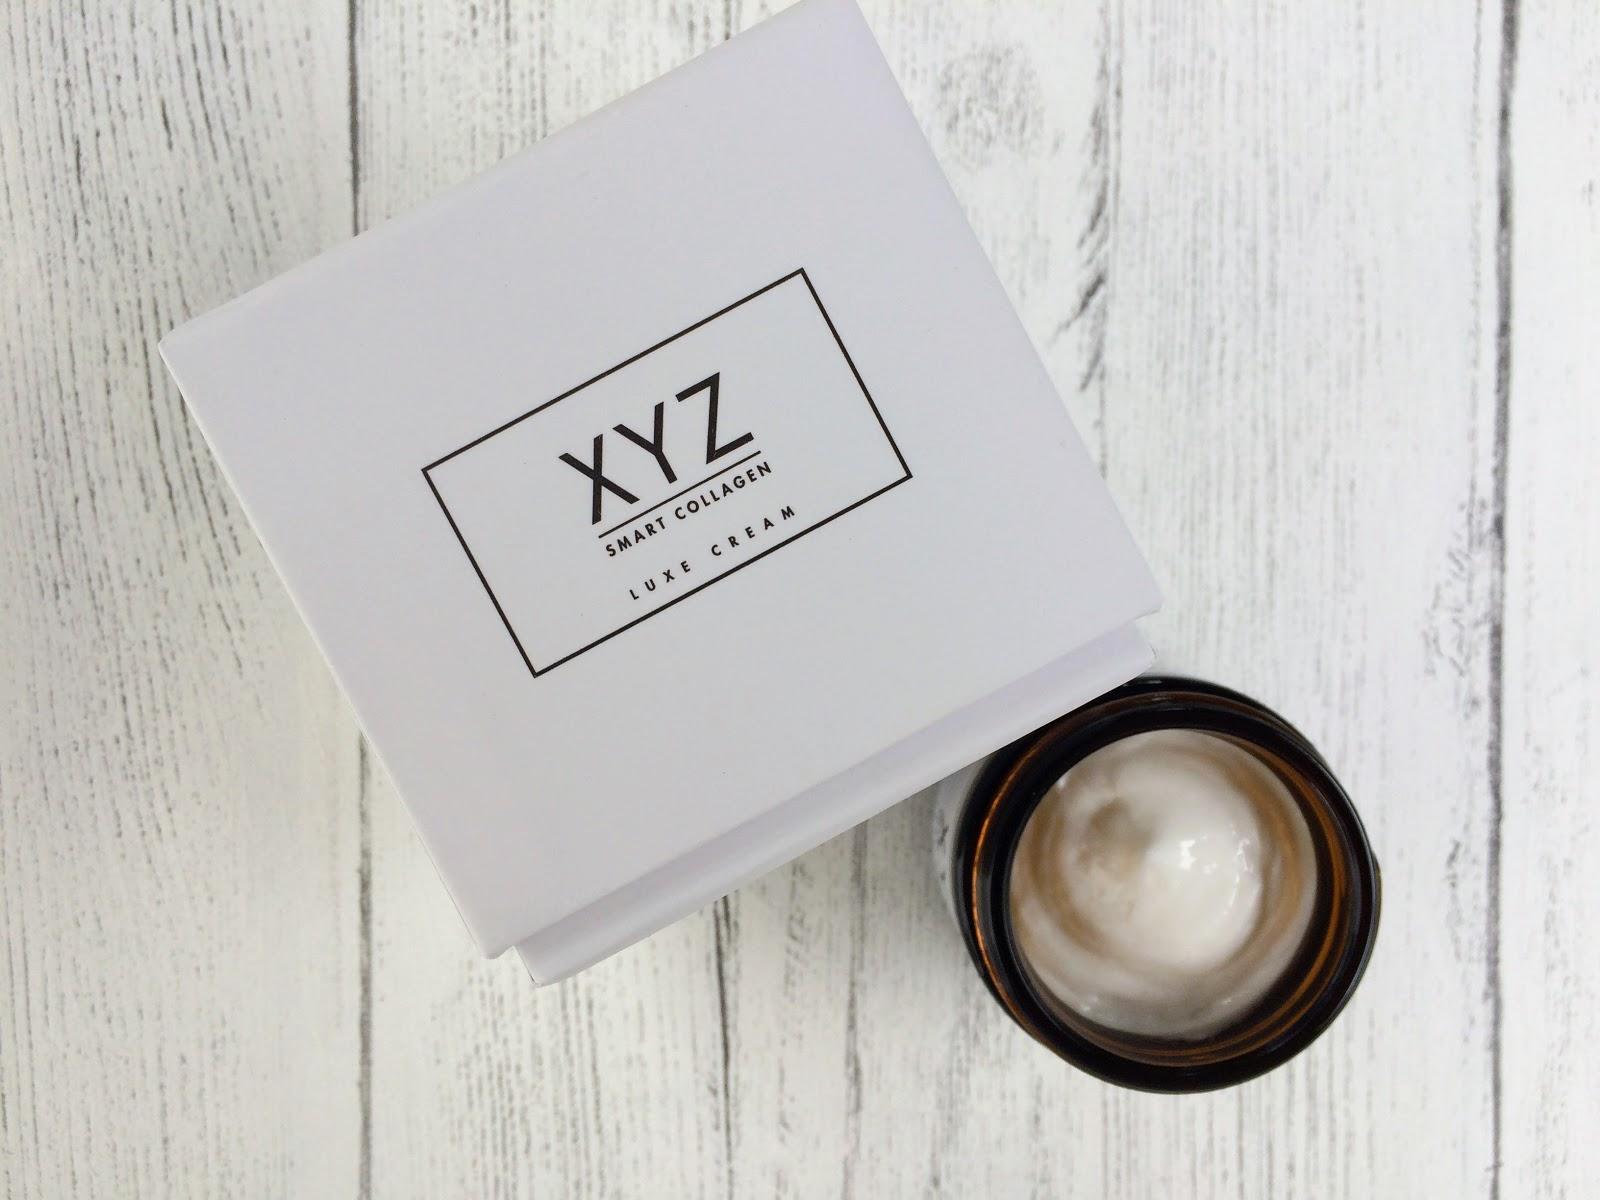 xyz smart collagen lid off the pot